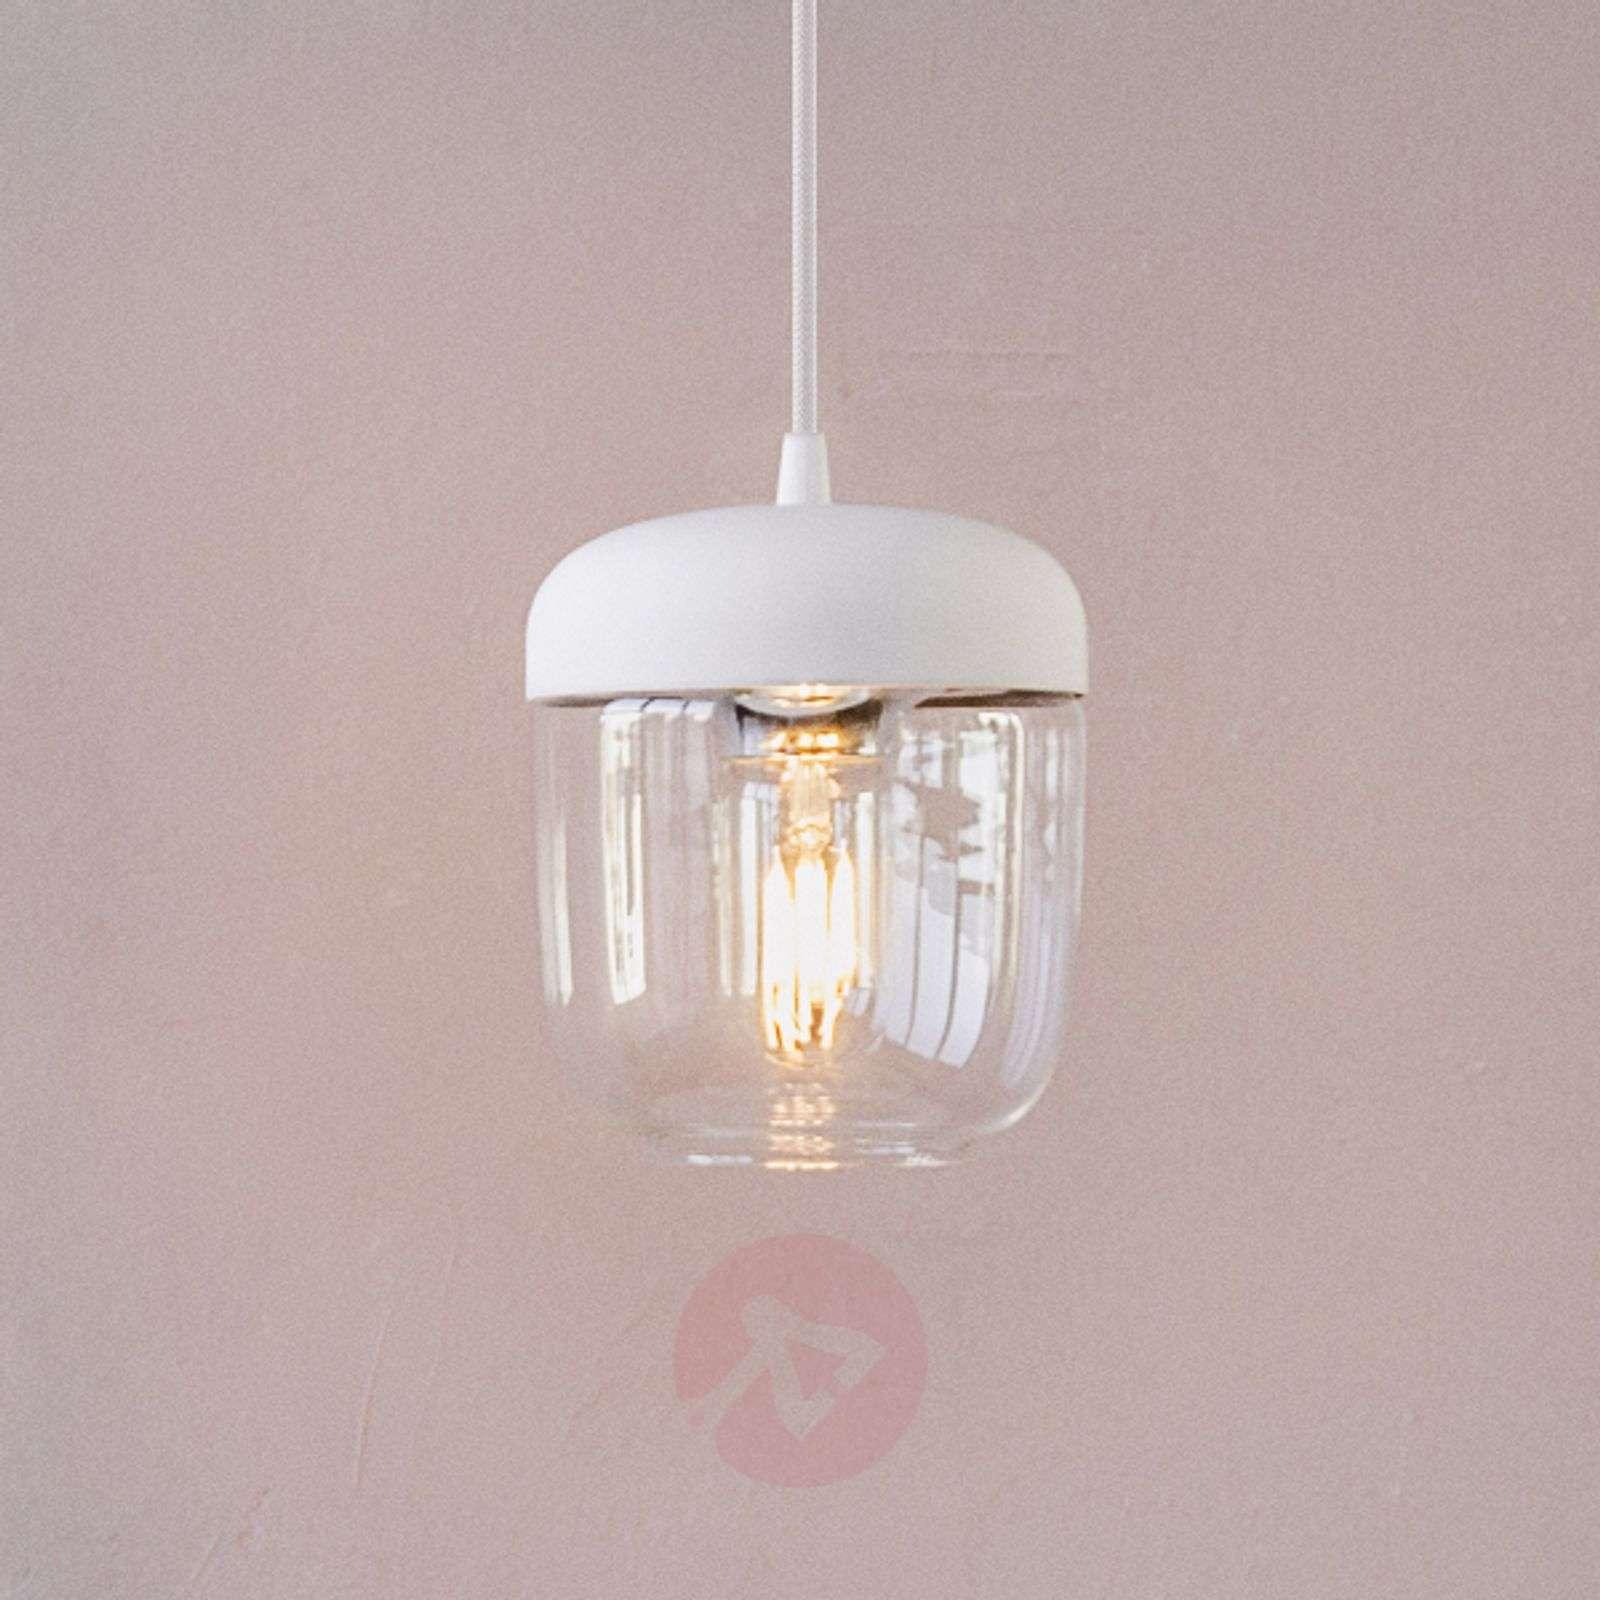 UMAGE Acorn hanging light white/brass-9521074-01